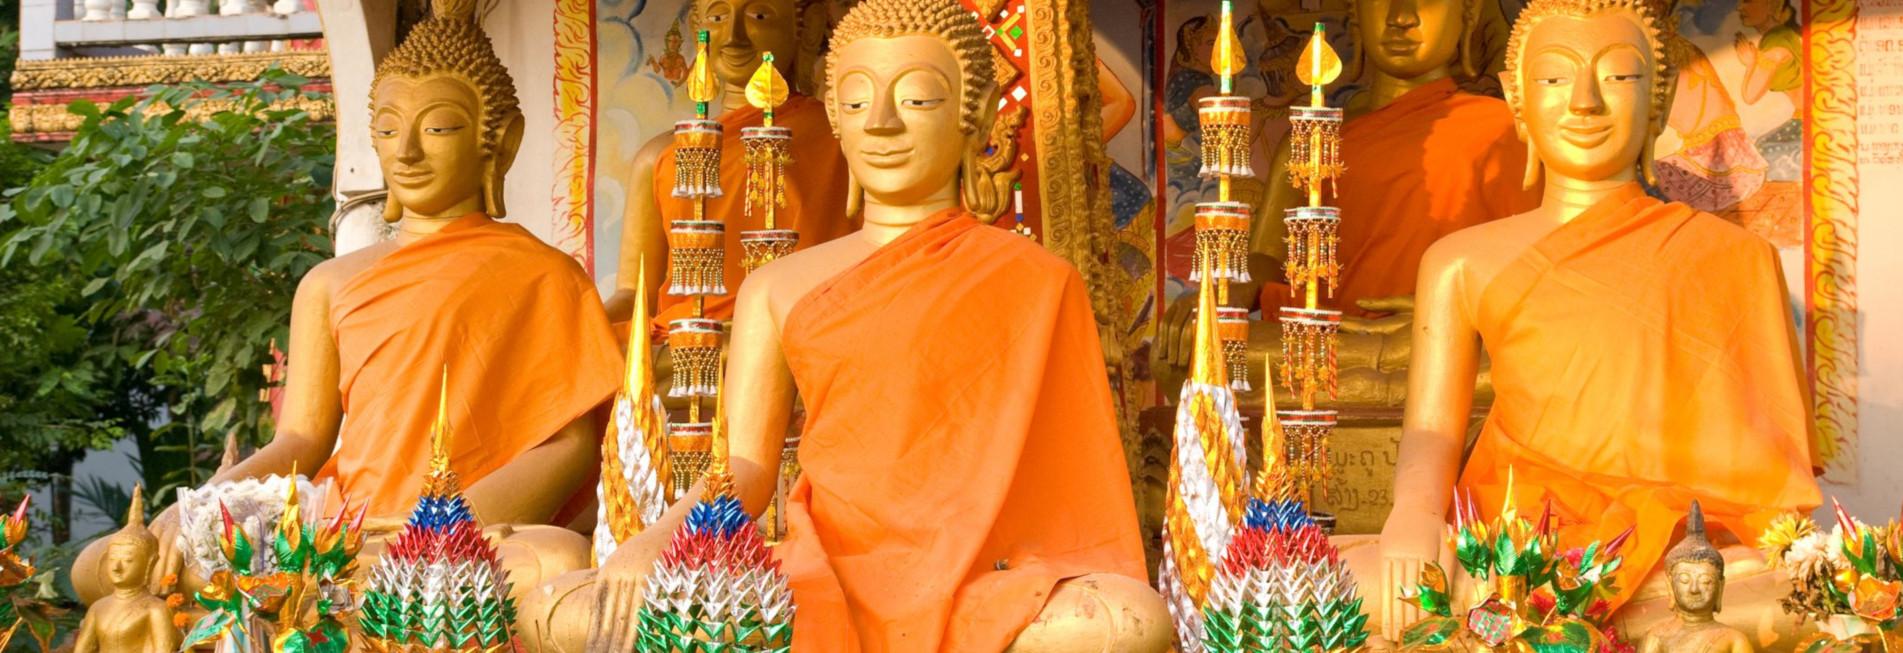 Buddha Wat That Luang in Vientiane